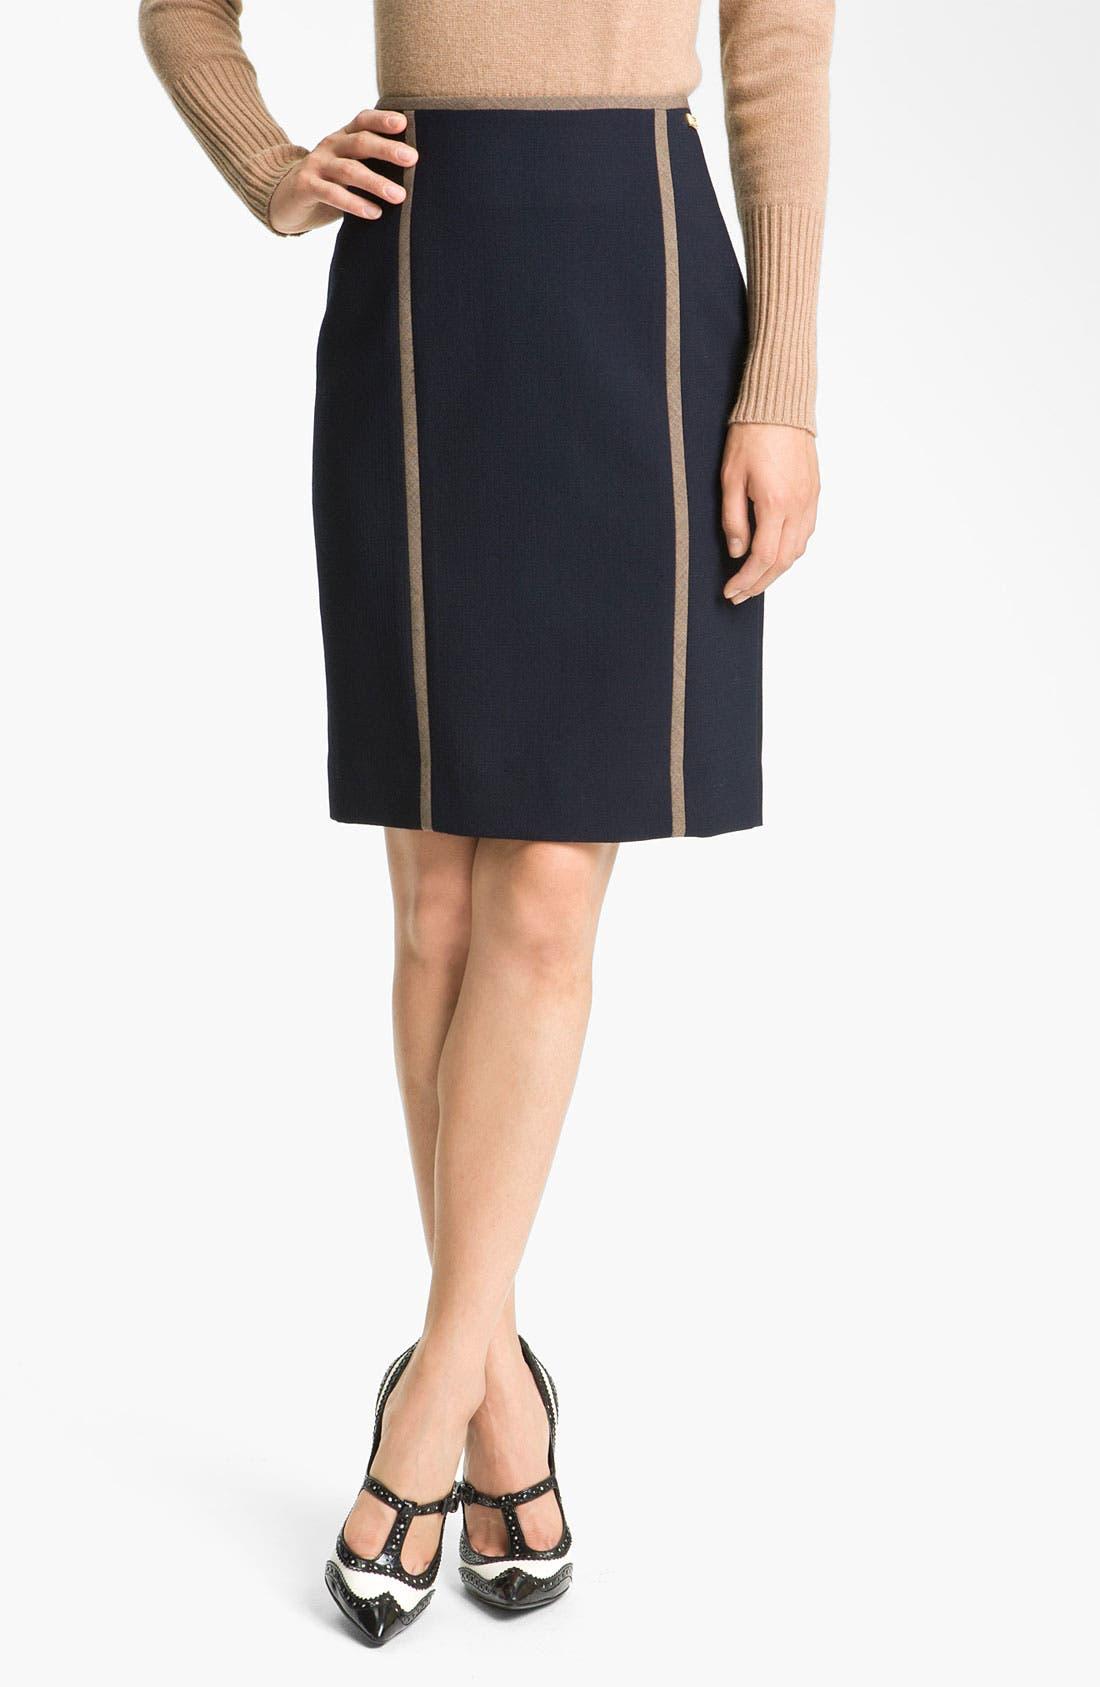 Alternate Image 1 Selected - Tory Burch 'Azalea' Skirt